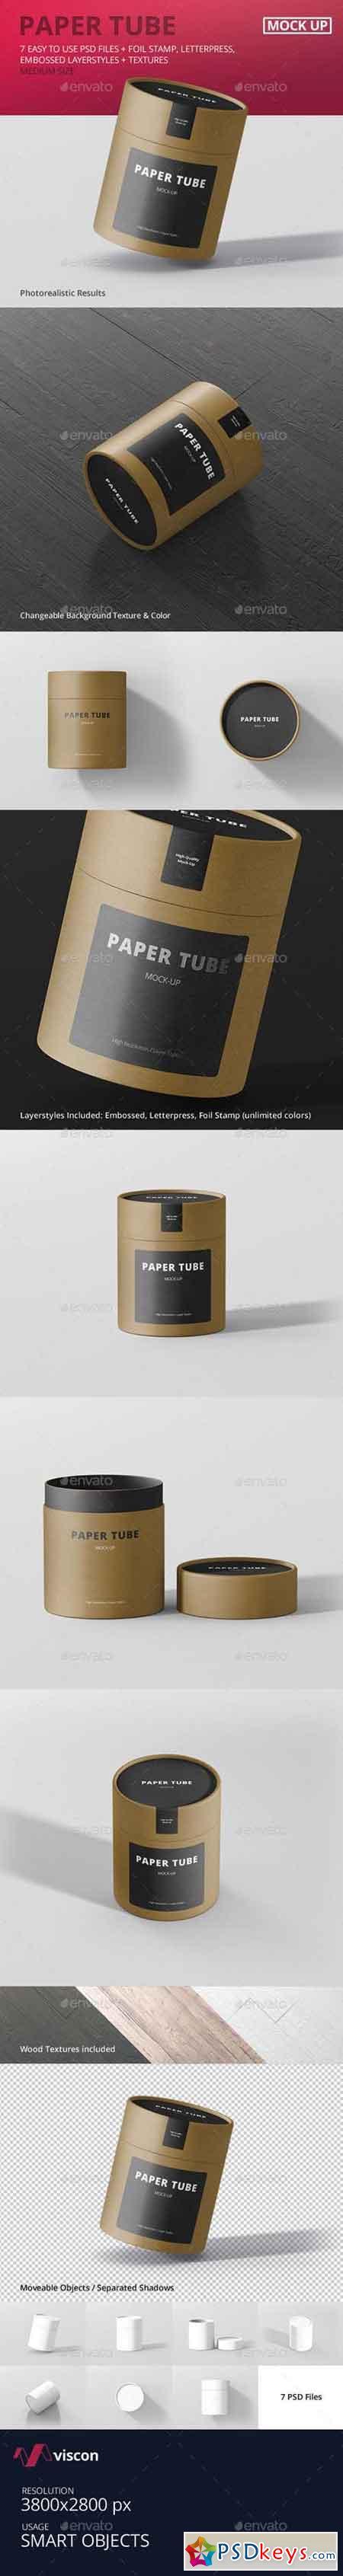 Paper Tube Packaging Mock-Up - Medium 16459367